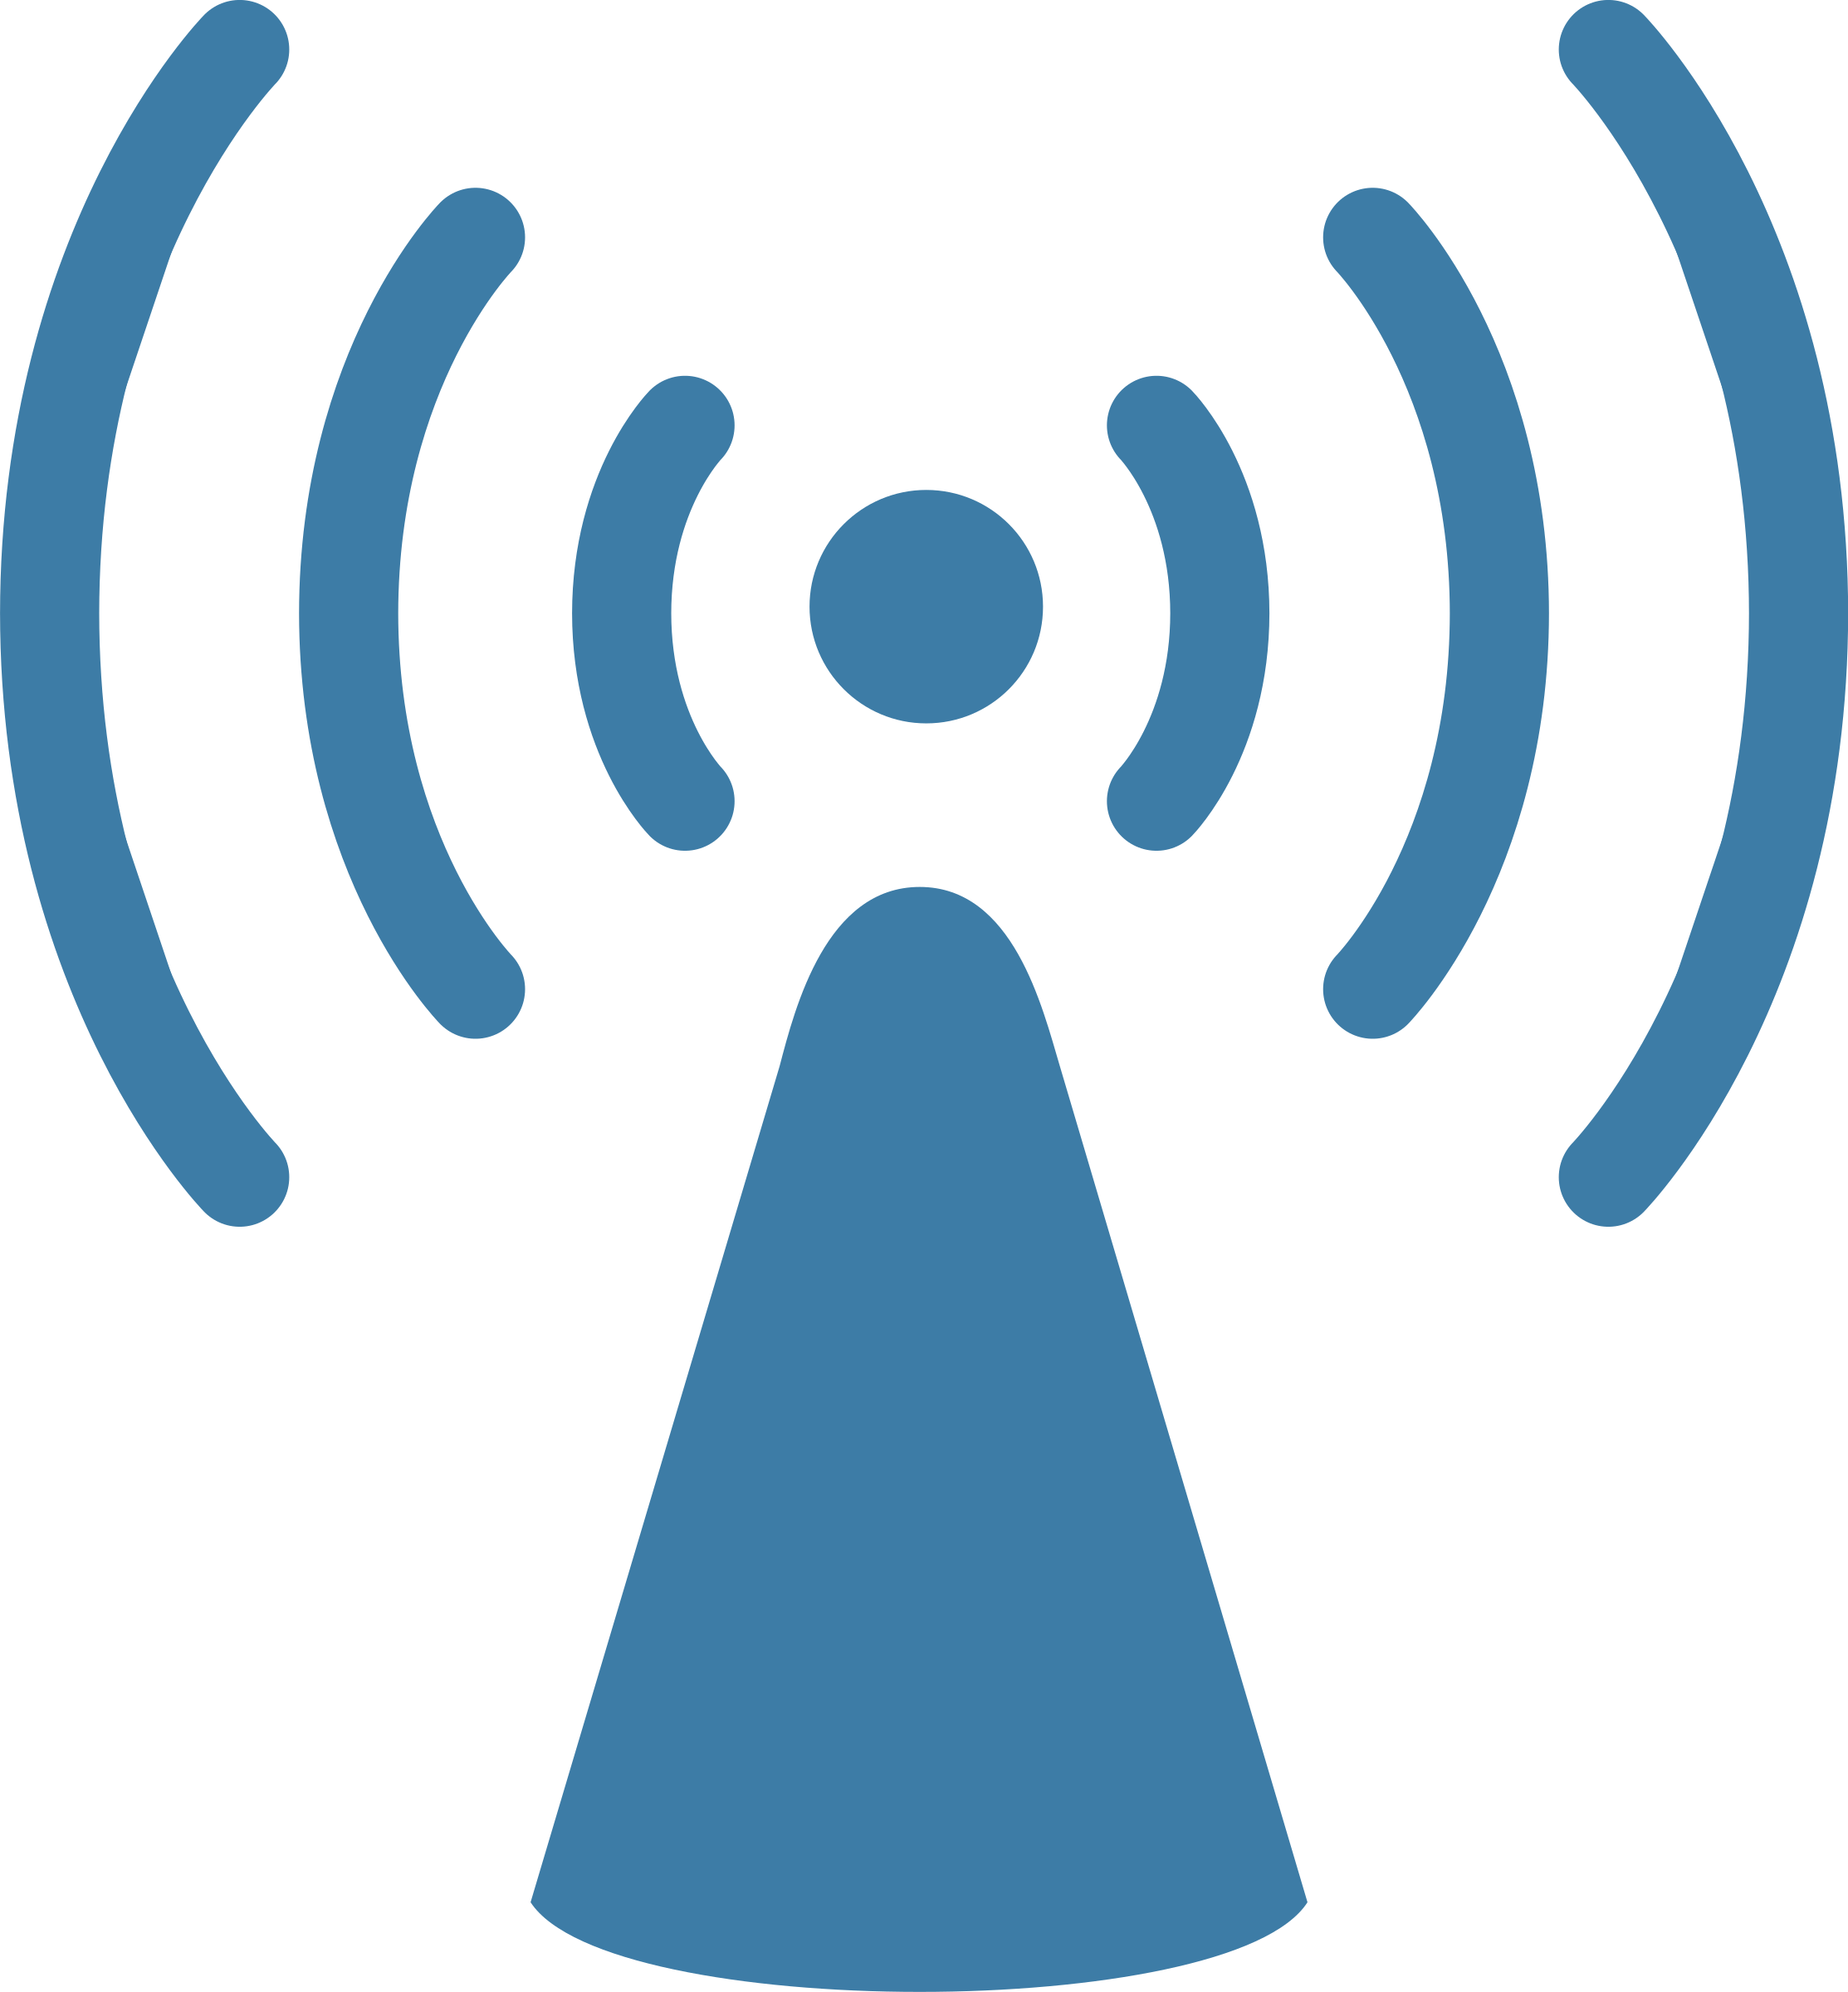 Wireless access point big. Communication clipart radio communication